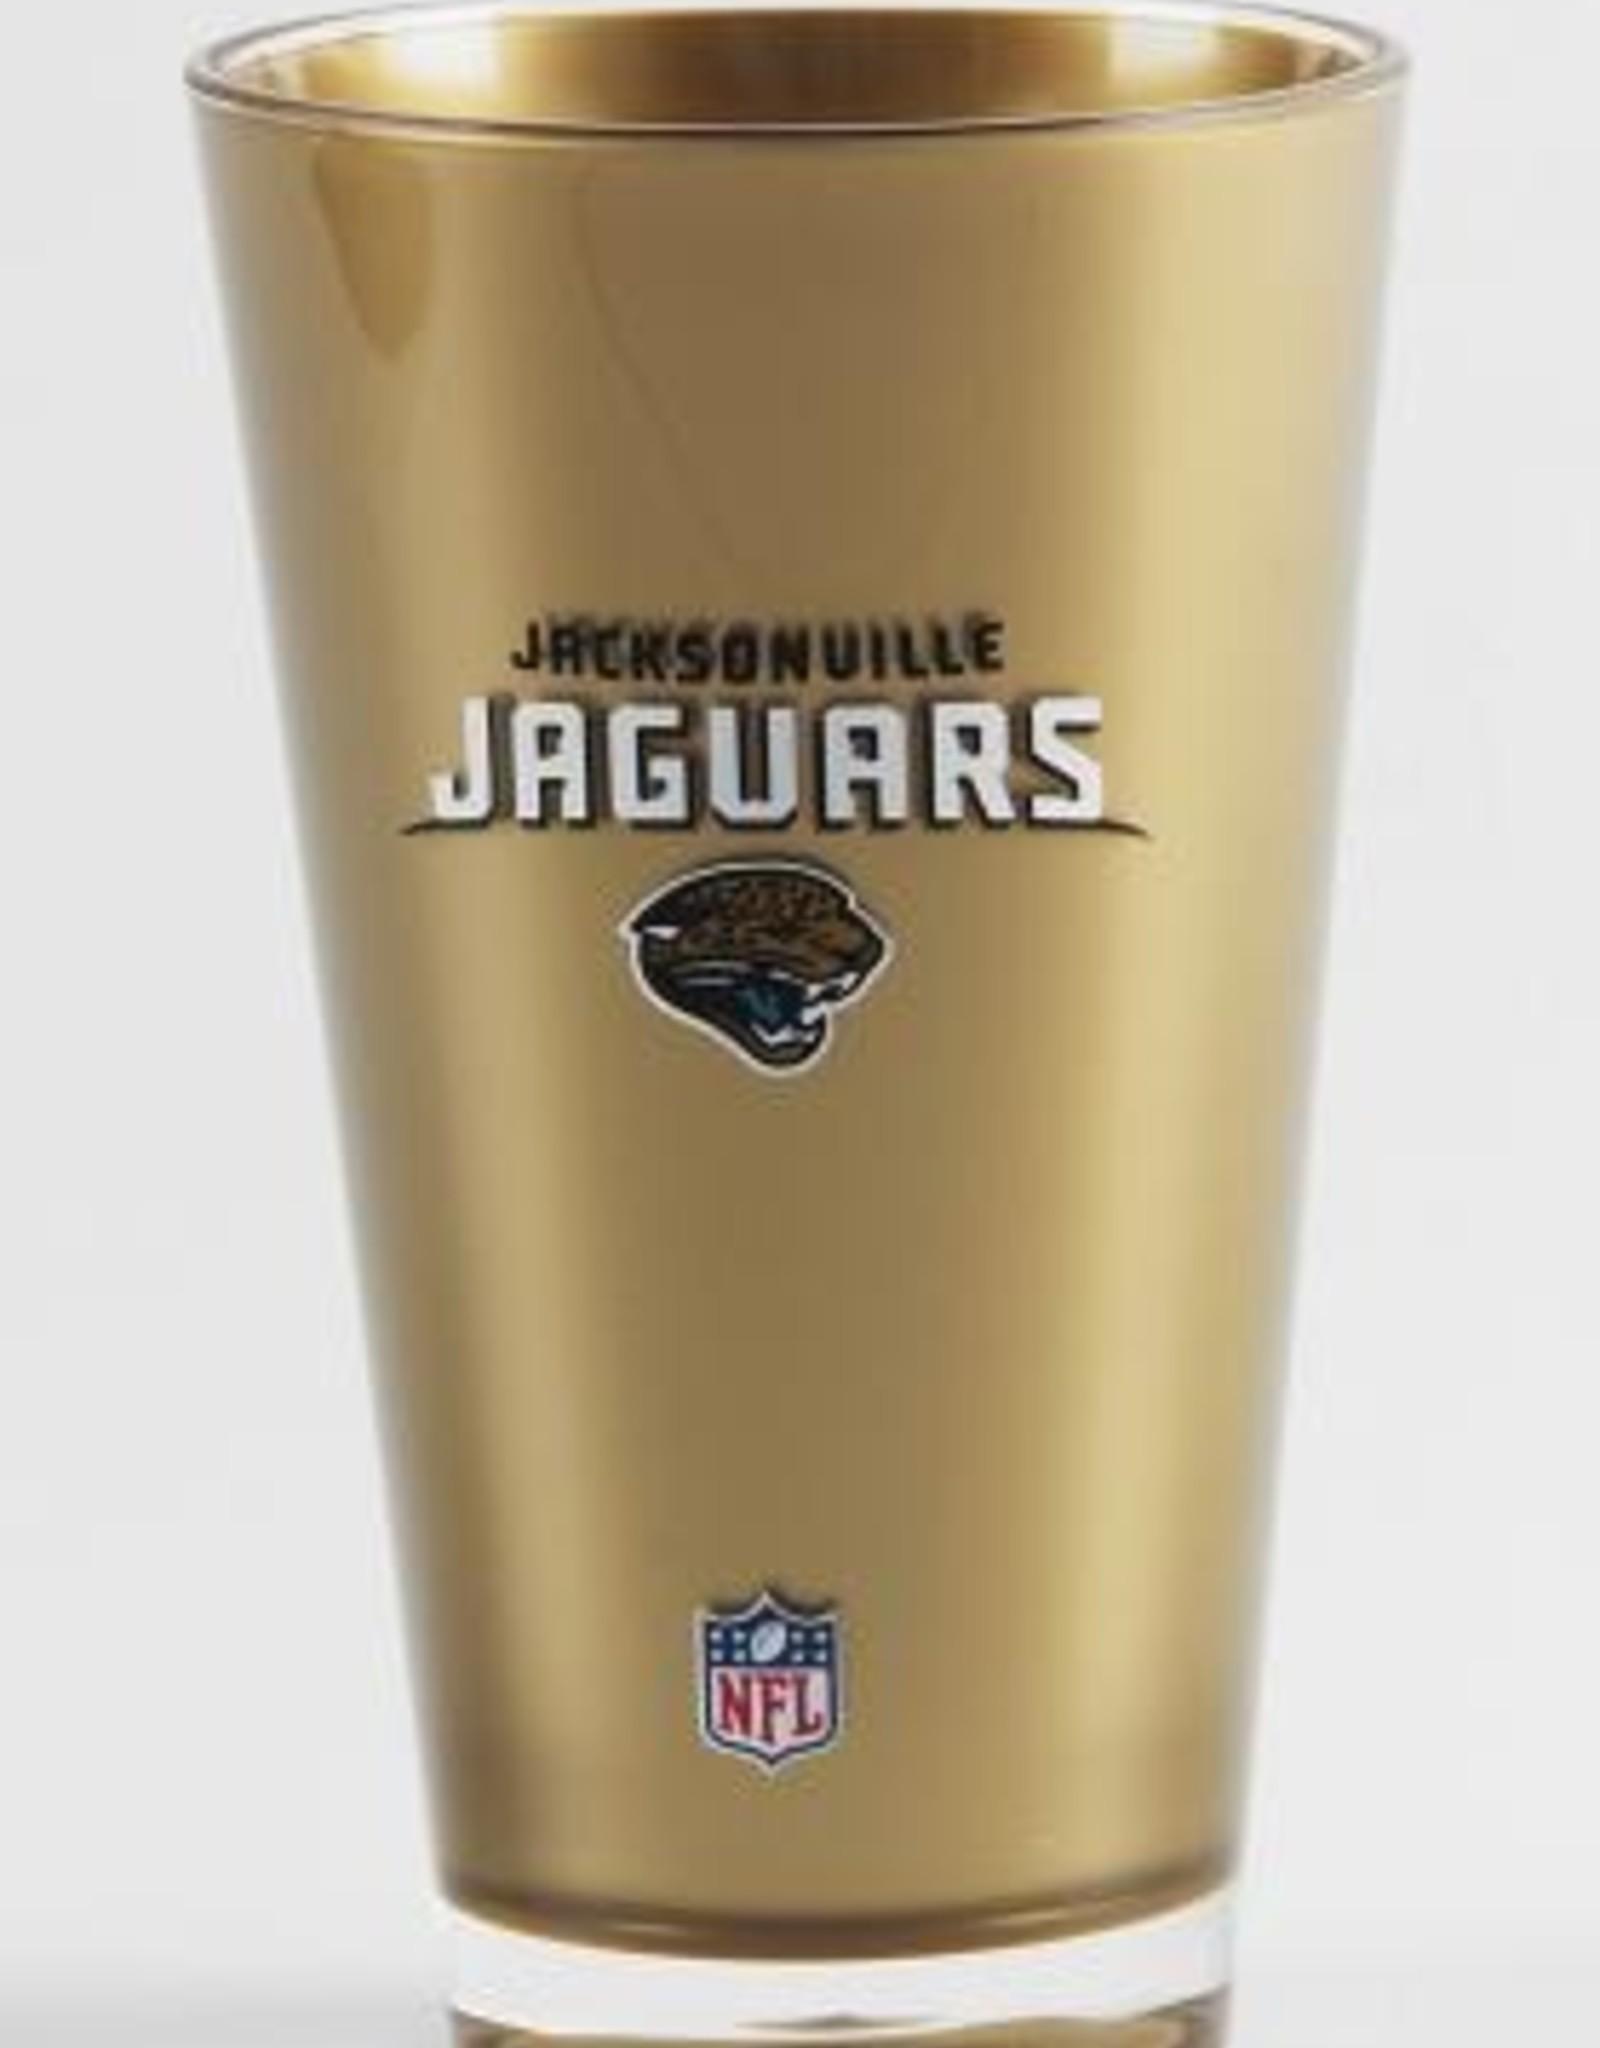 Jacksonville Jaguars Insulated 20oz Acrylic Tumbler